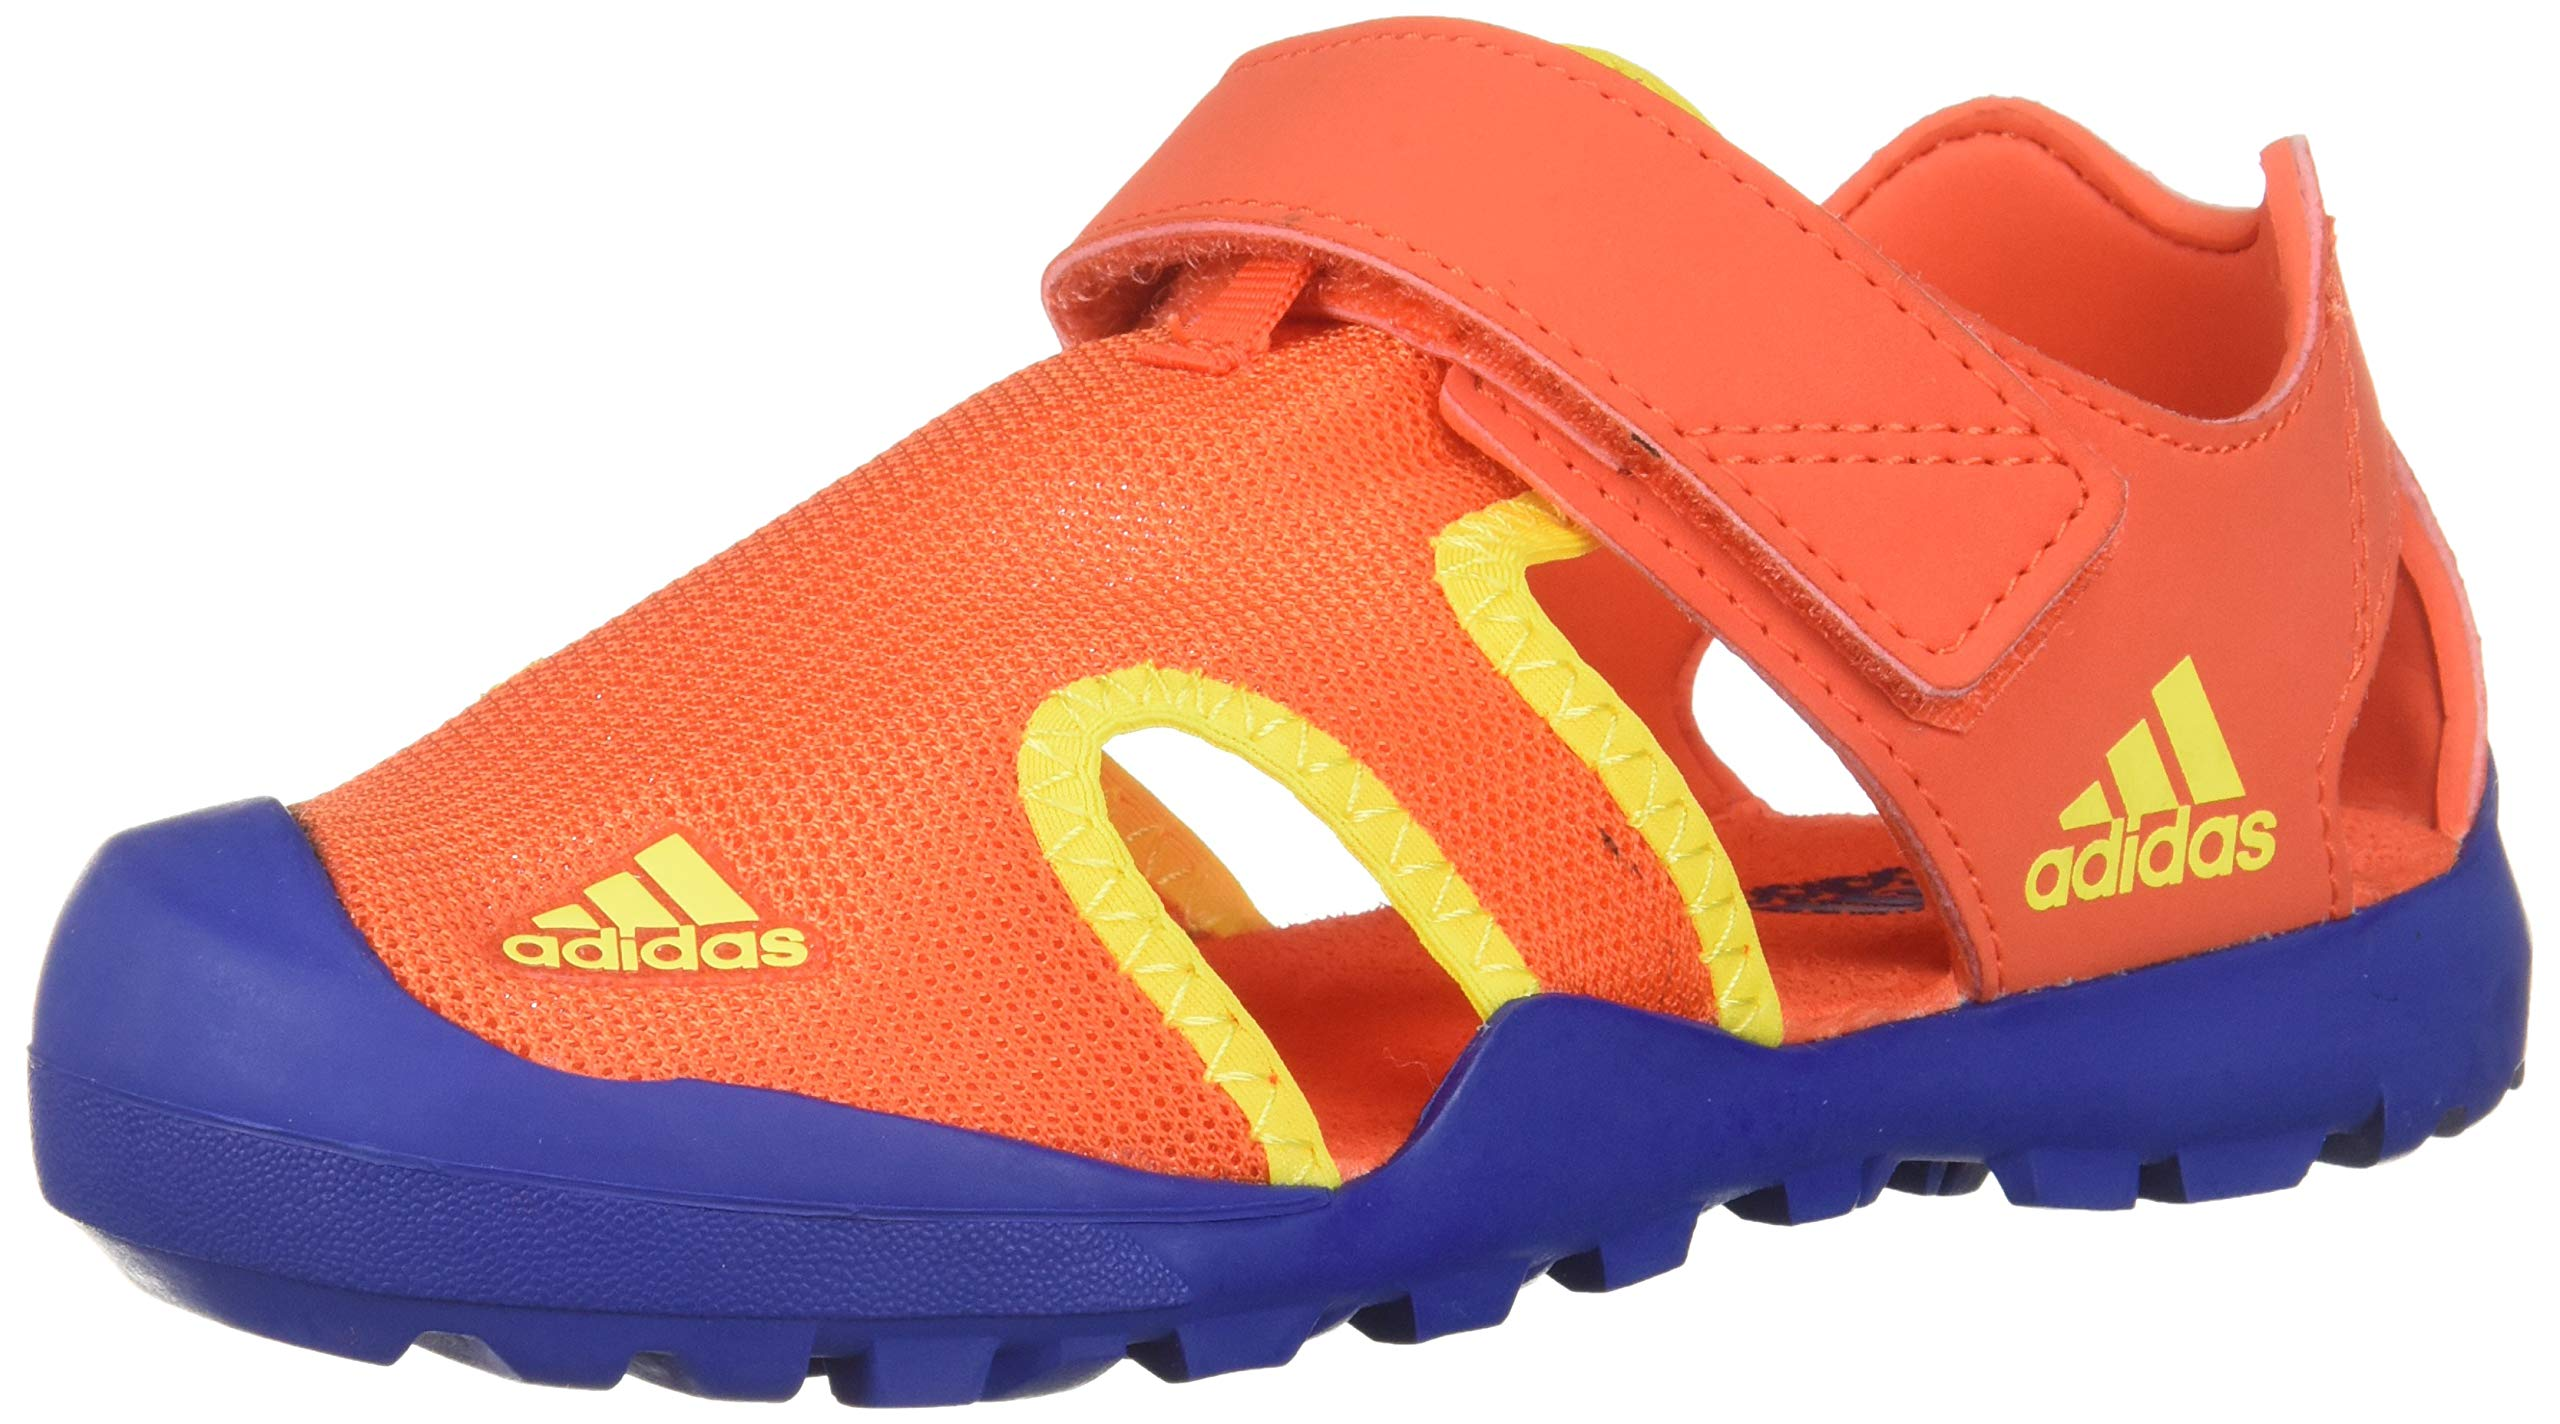 adidas outdoor Captain TOEY Kids Water Sports Shoe Sandal, Active Orange/Collegiate Royal/Shock Yellow, 11K Child US Little